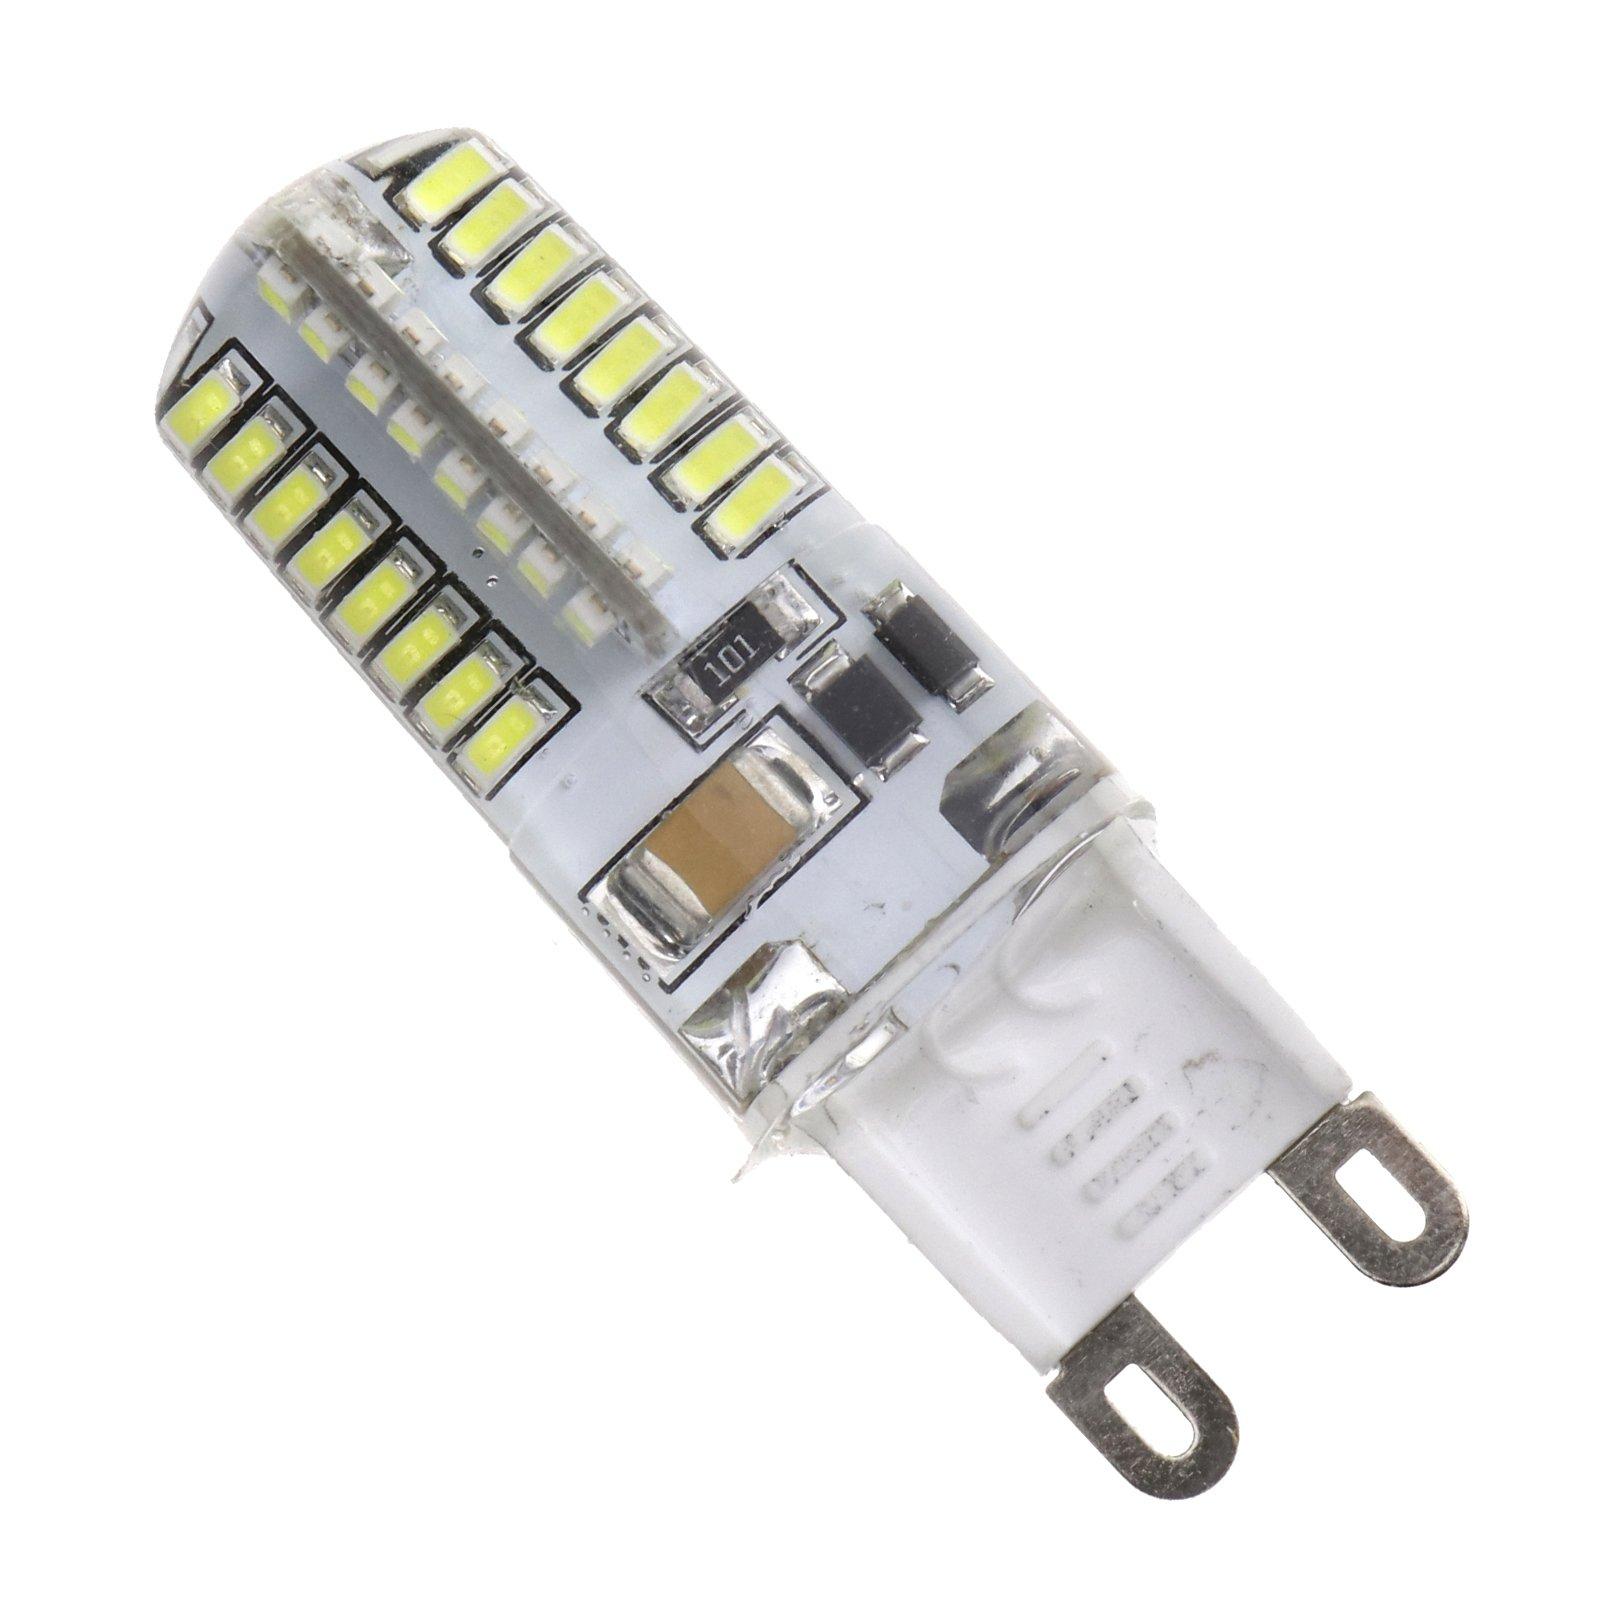 YINETTECH 5X G9 3W LED Bombilla 3014 64 SMD Luz 6000K Blanco Frío Recambio CE ROHS: Amazon.es: Hogar